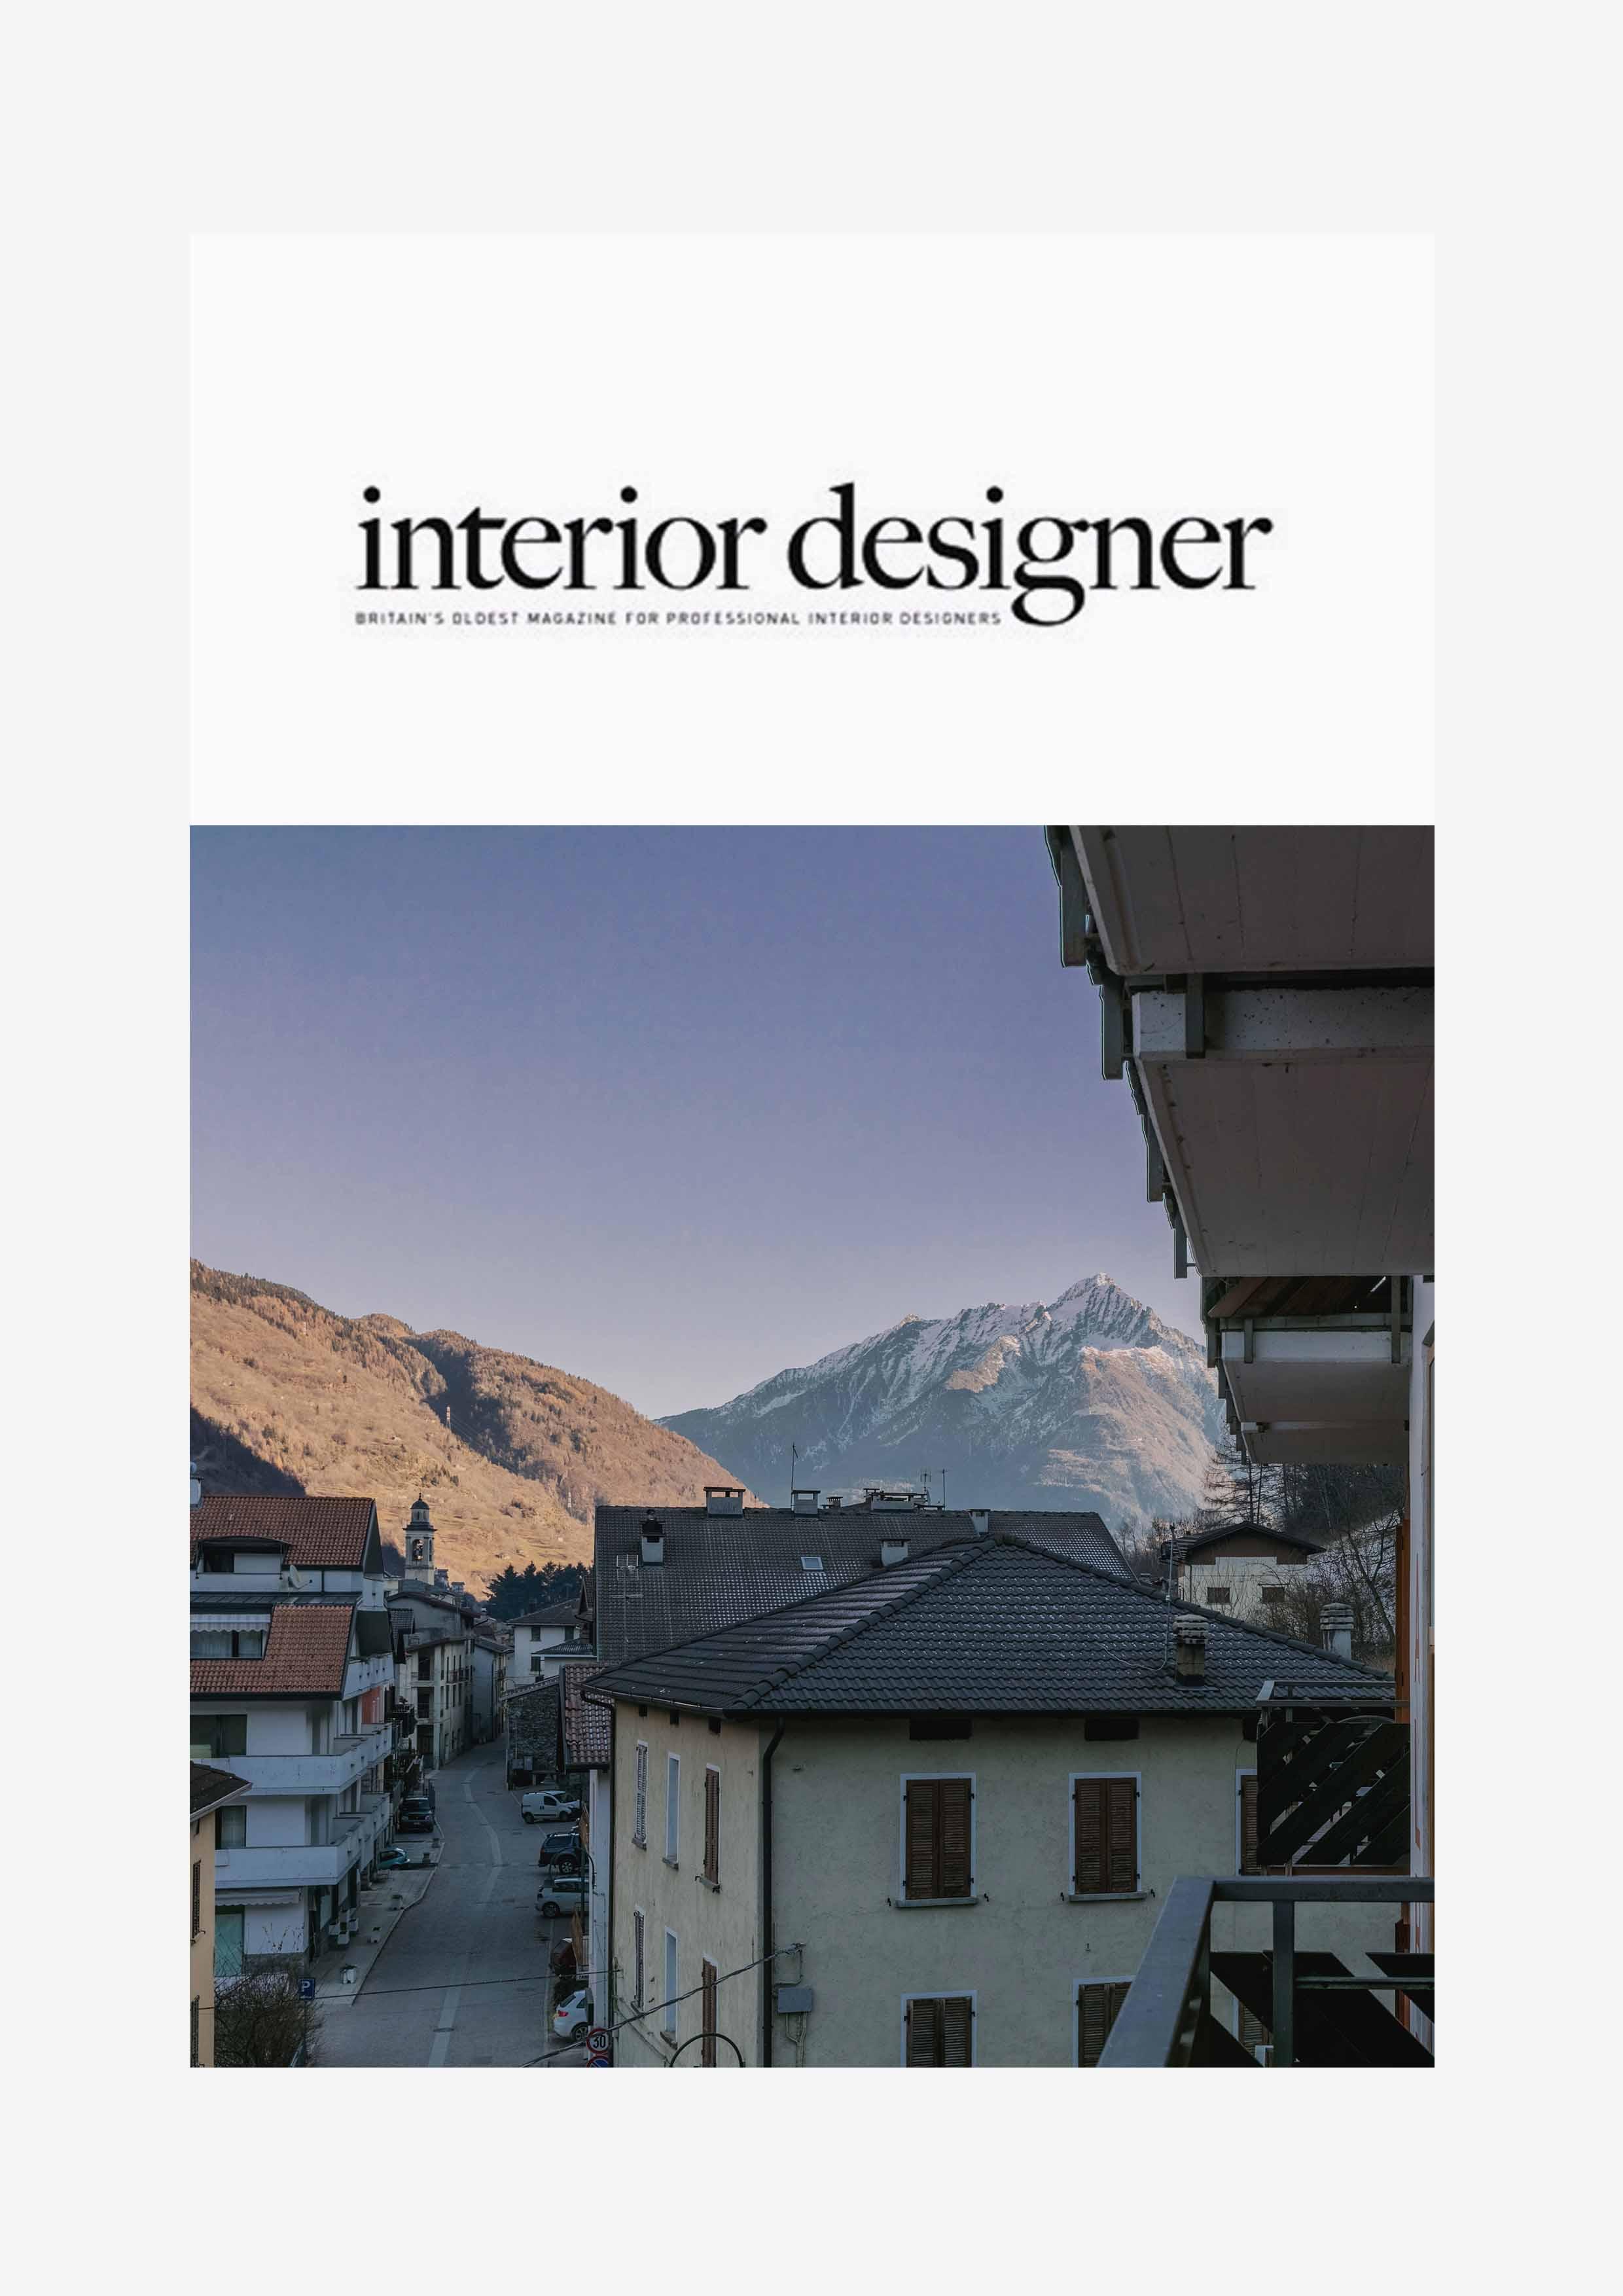 Interior Designer magazine Miramonti Boxx Creative